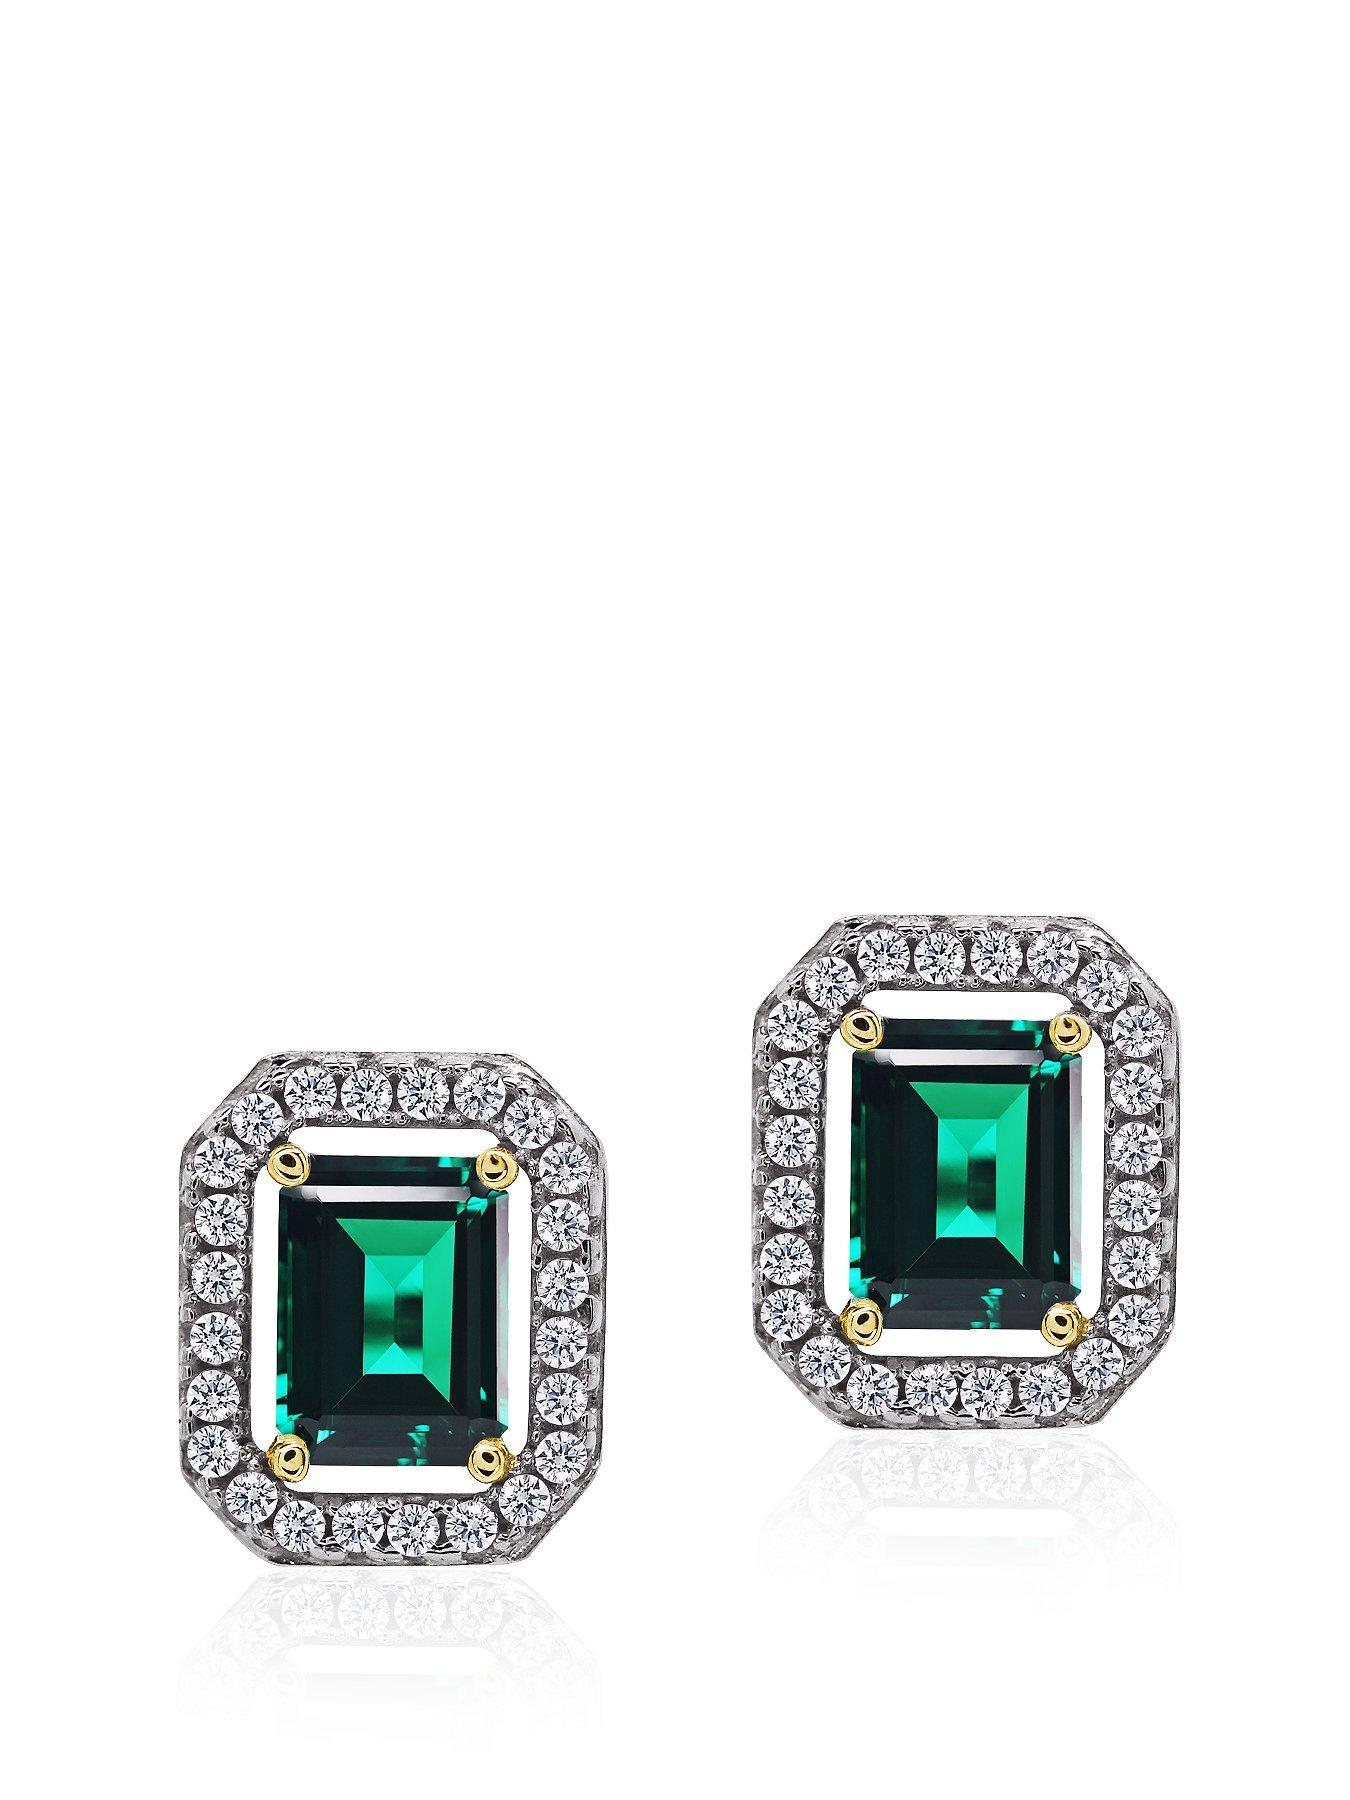 Sterling Silver Square Emerald Green BorderSet Earrings